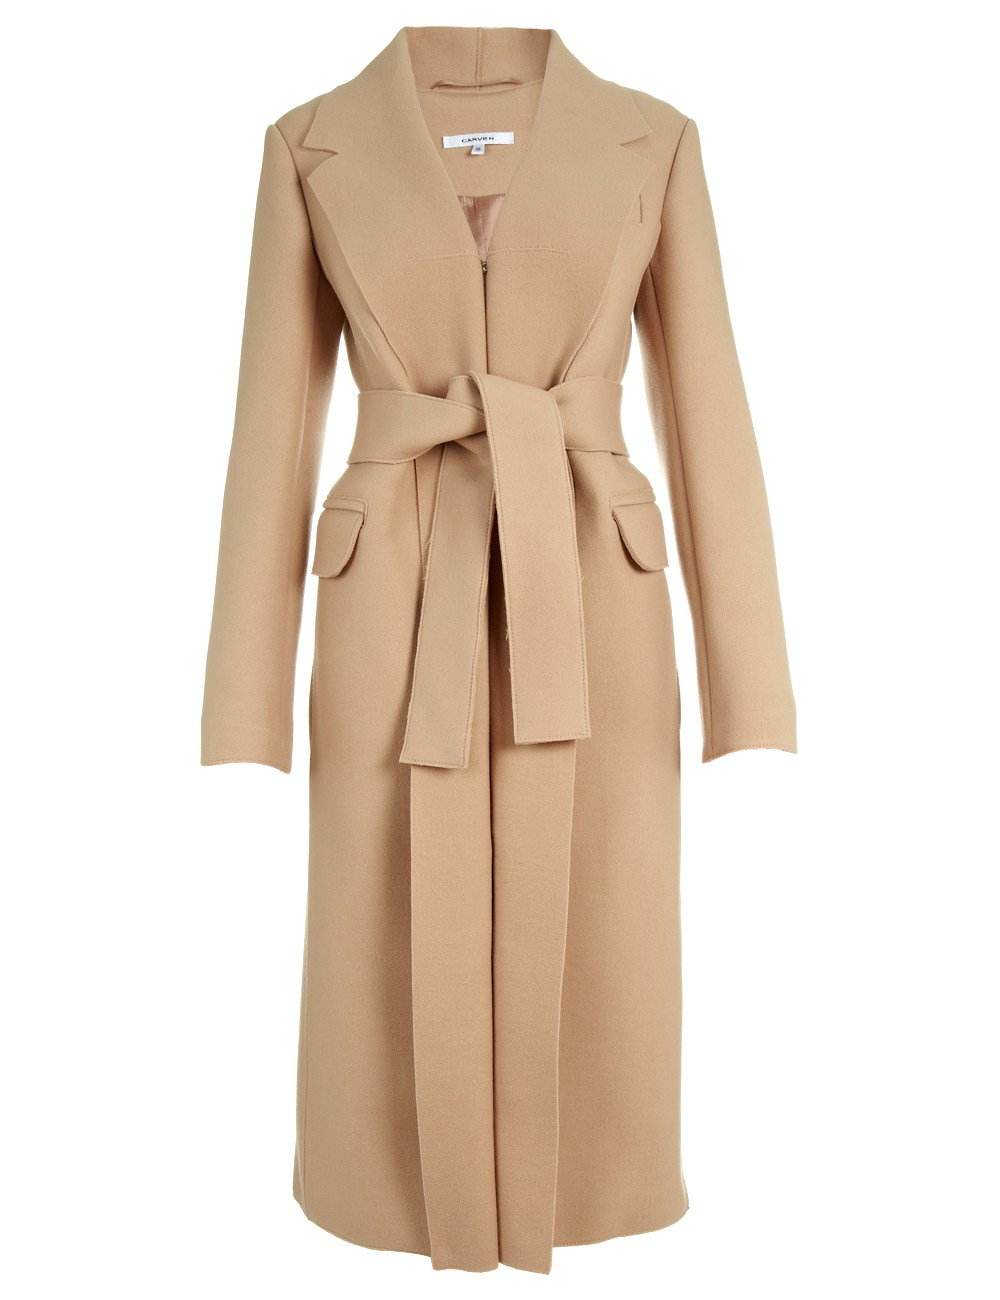 Carven Camel Wool Coat in Brown | Lyst